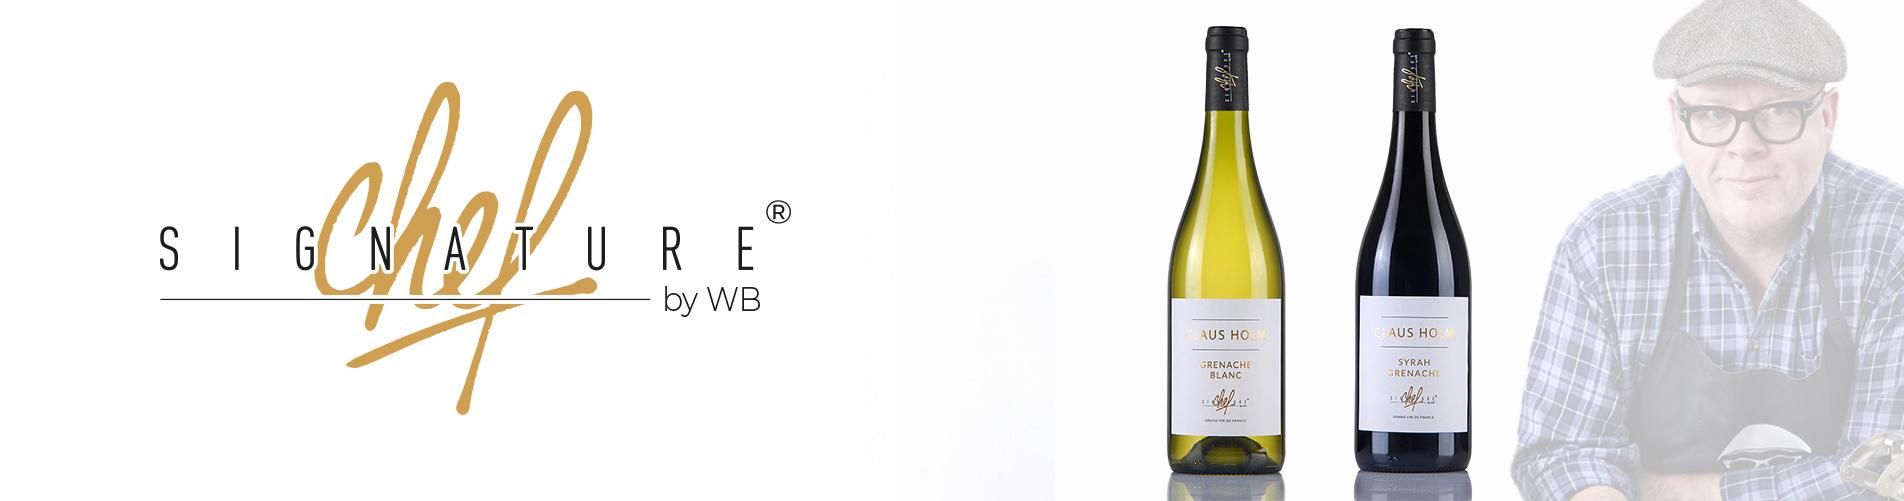 signature-chef-wines-brands-claus-holm